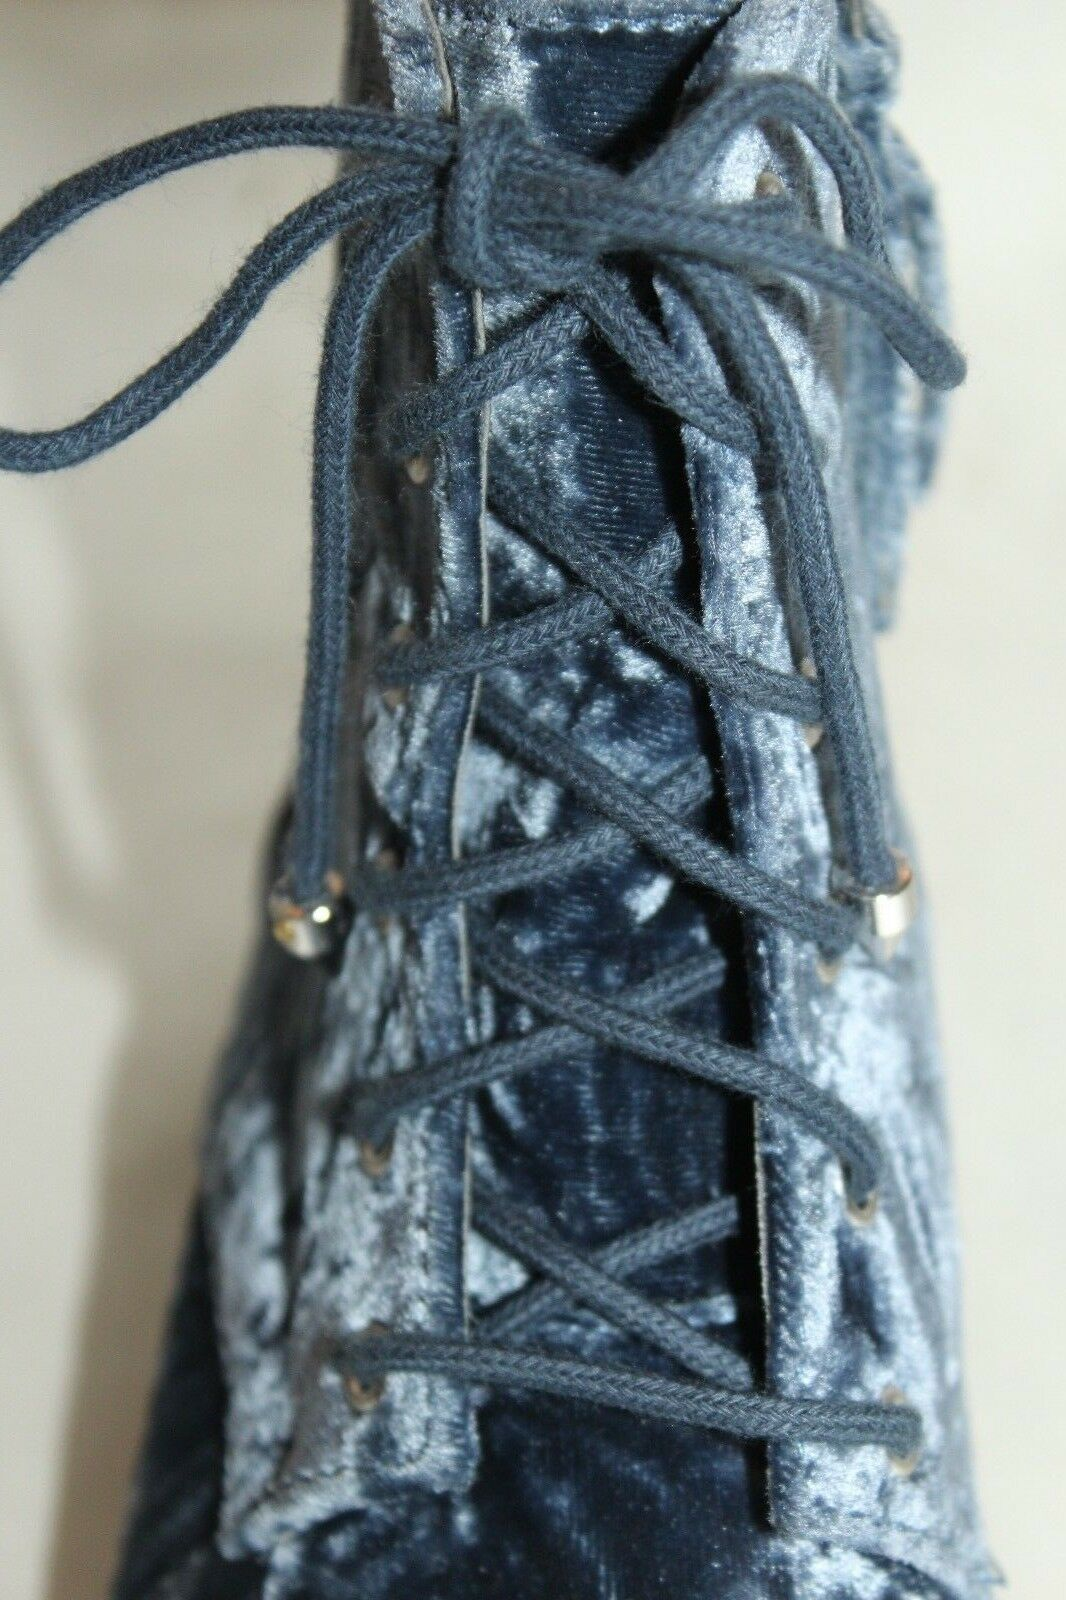 Nuevo  nuevo En En En Caja  Rebecca Minkoff Azul Crushed Velvet Gerry Moto Biker botas de Combate Talla 6 acf727